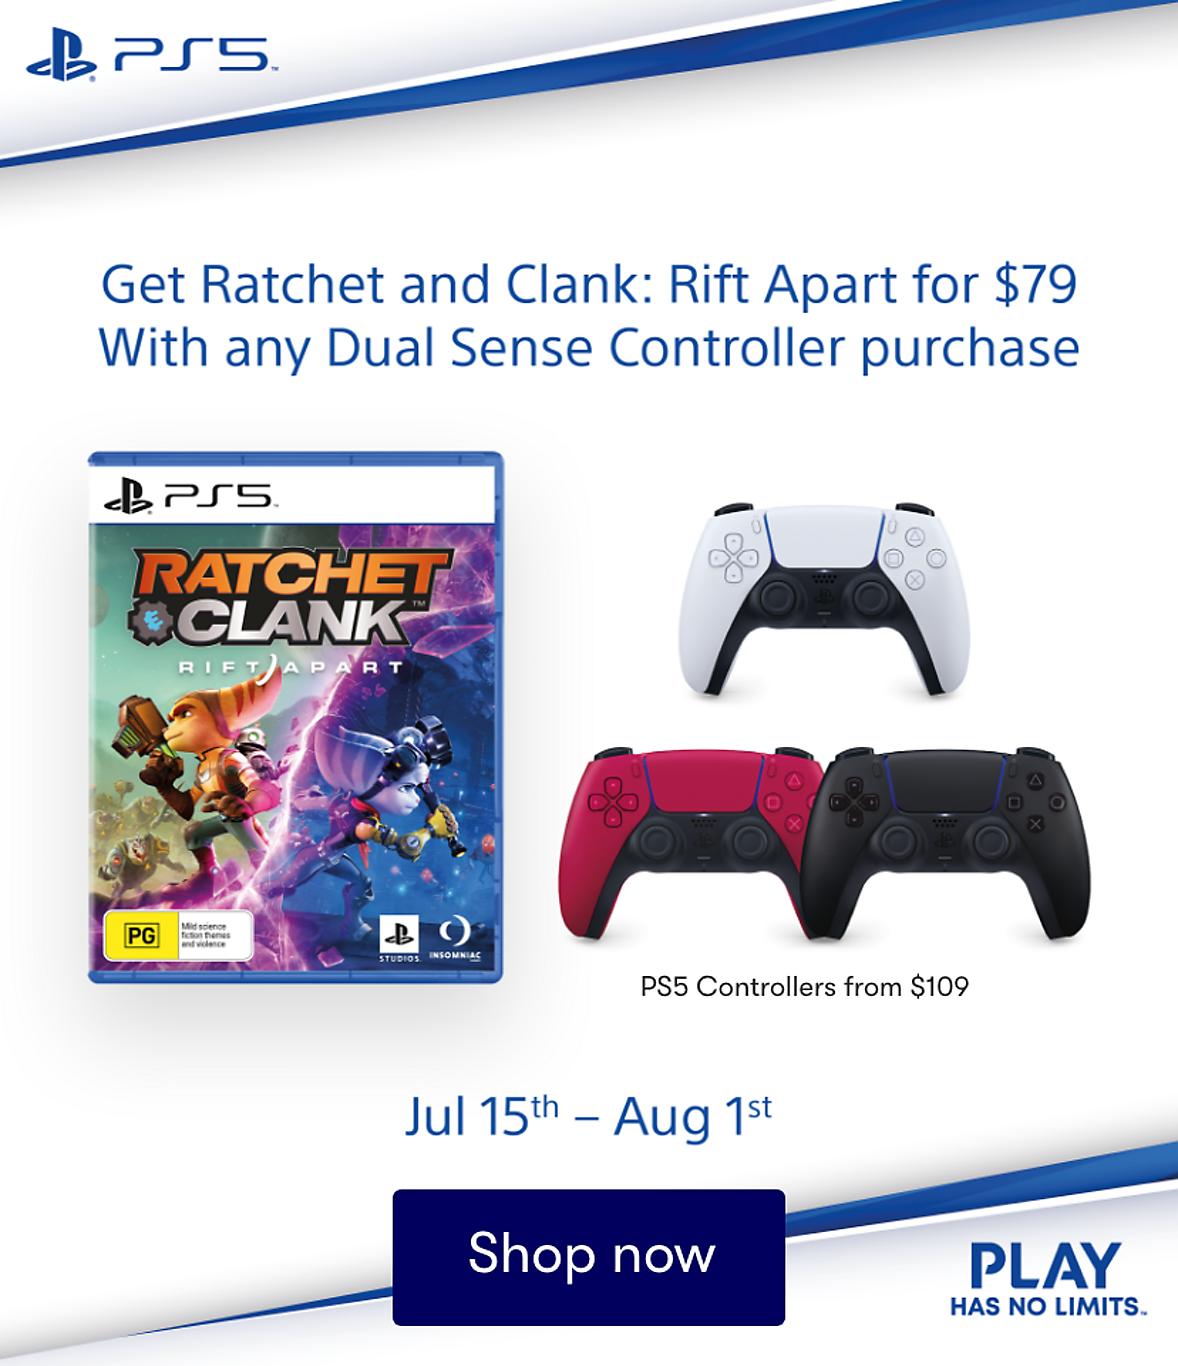 Ratchet & Clark Rift Apart + Dual Sense Controller